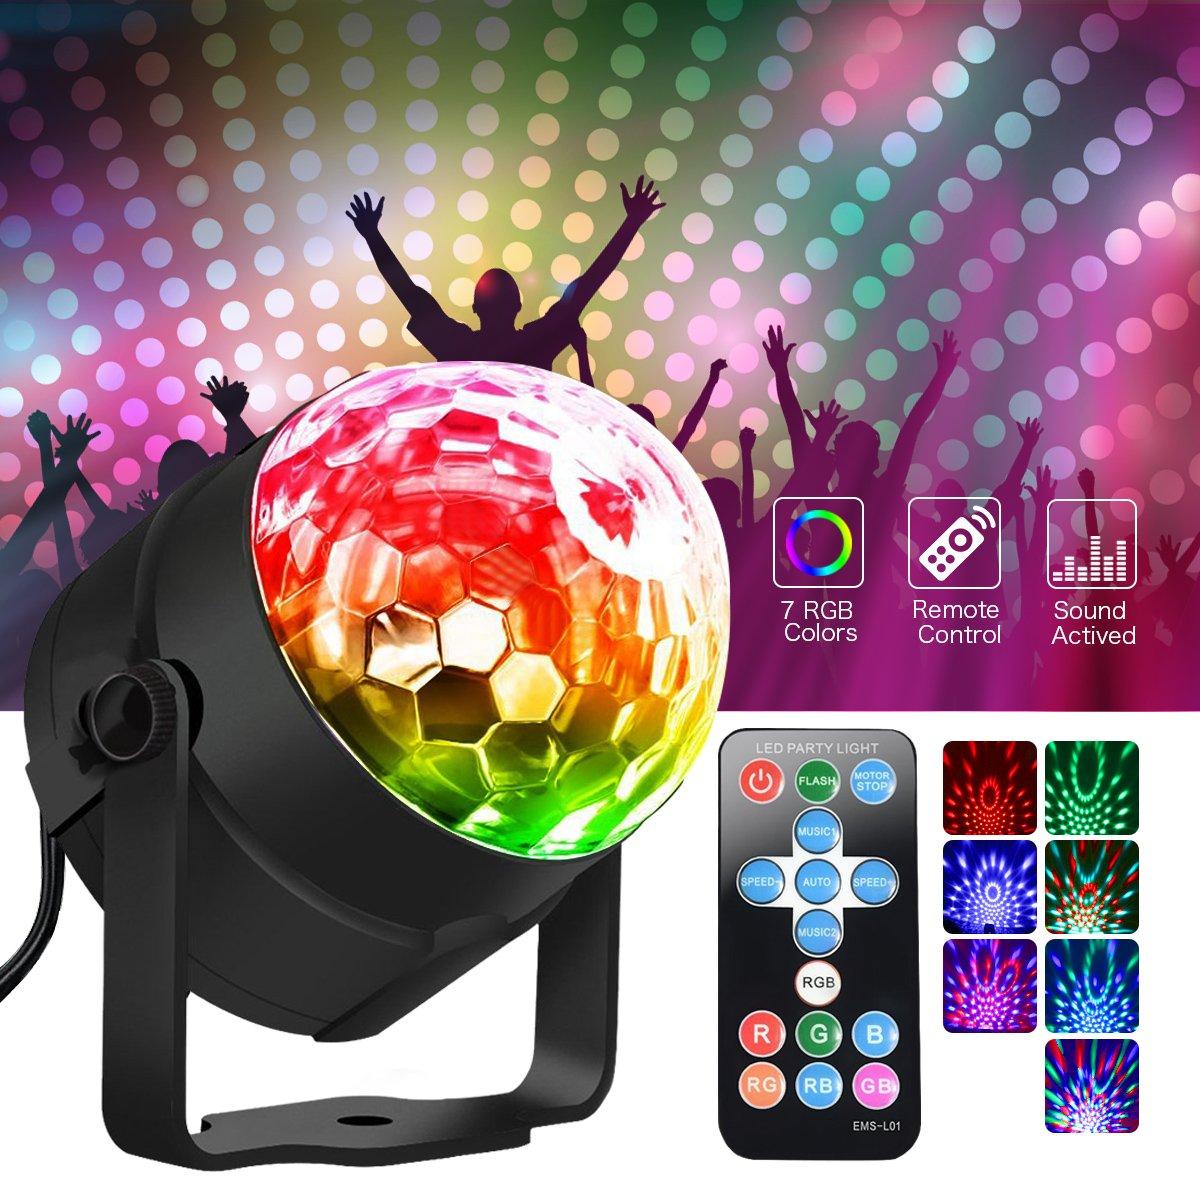 Metalbay LED Discoteca Party luci RGB LED AC85-240V 5W Ball Lighting Light DJ Disco Stage lampada multicolore con telecomando per Anniversary Party KTV regalo di Natale… 239390